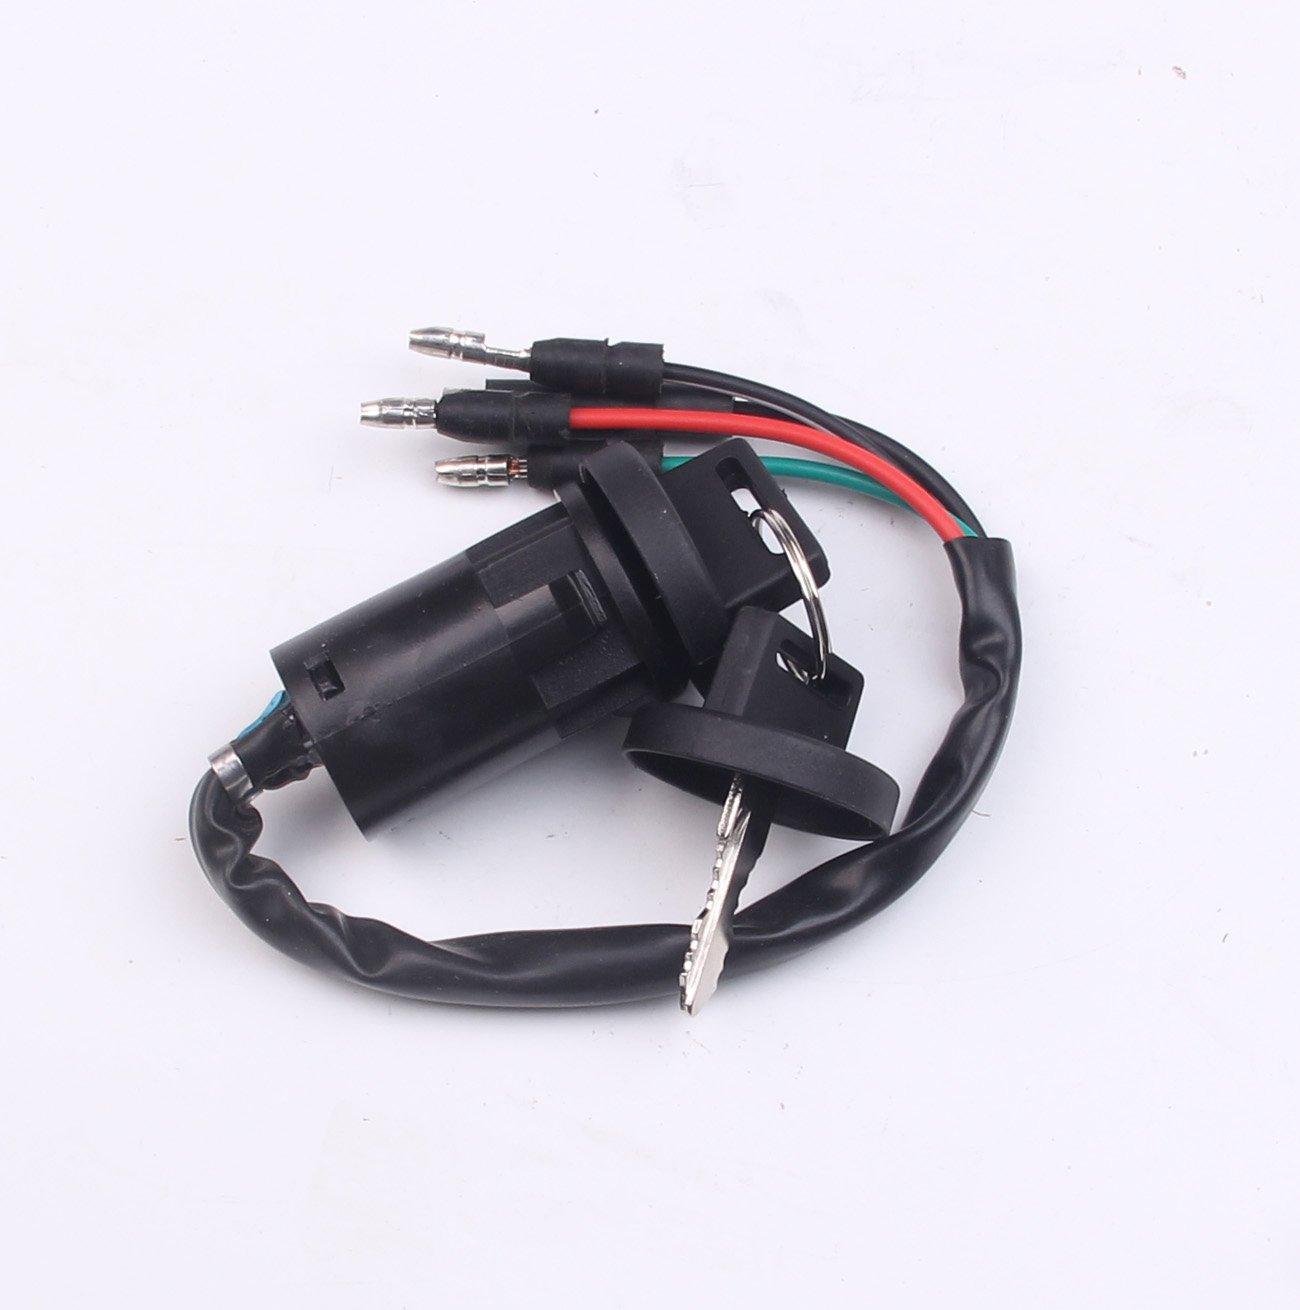 NEW Ignition Key Switch for Honda FourTrax 200 TRX200SX 1986-1987 BH-Motor